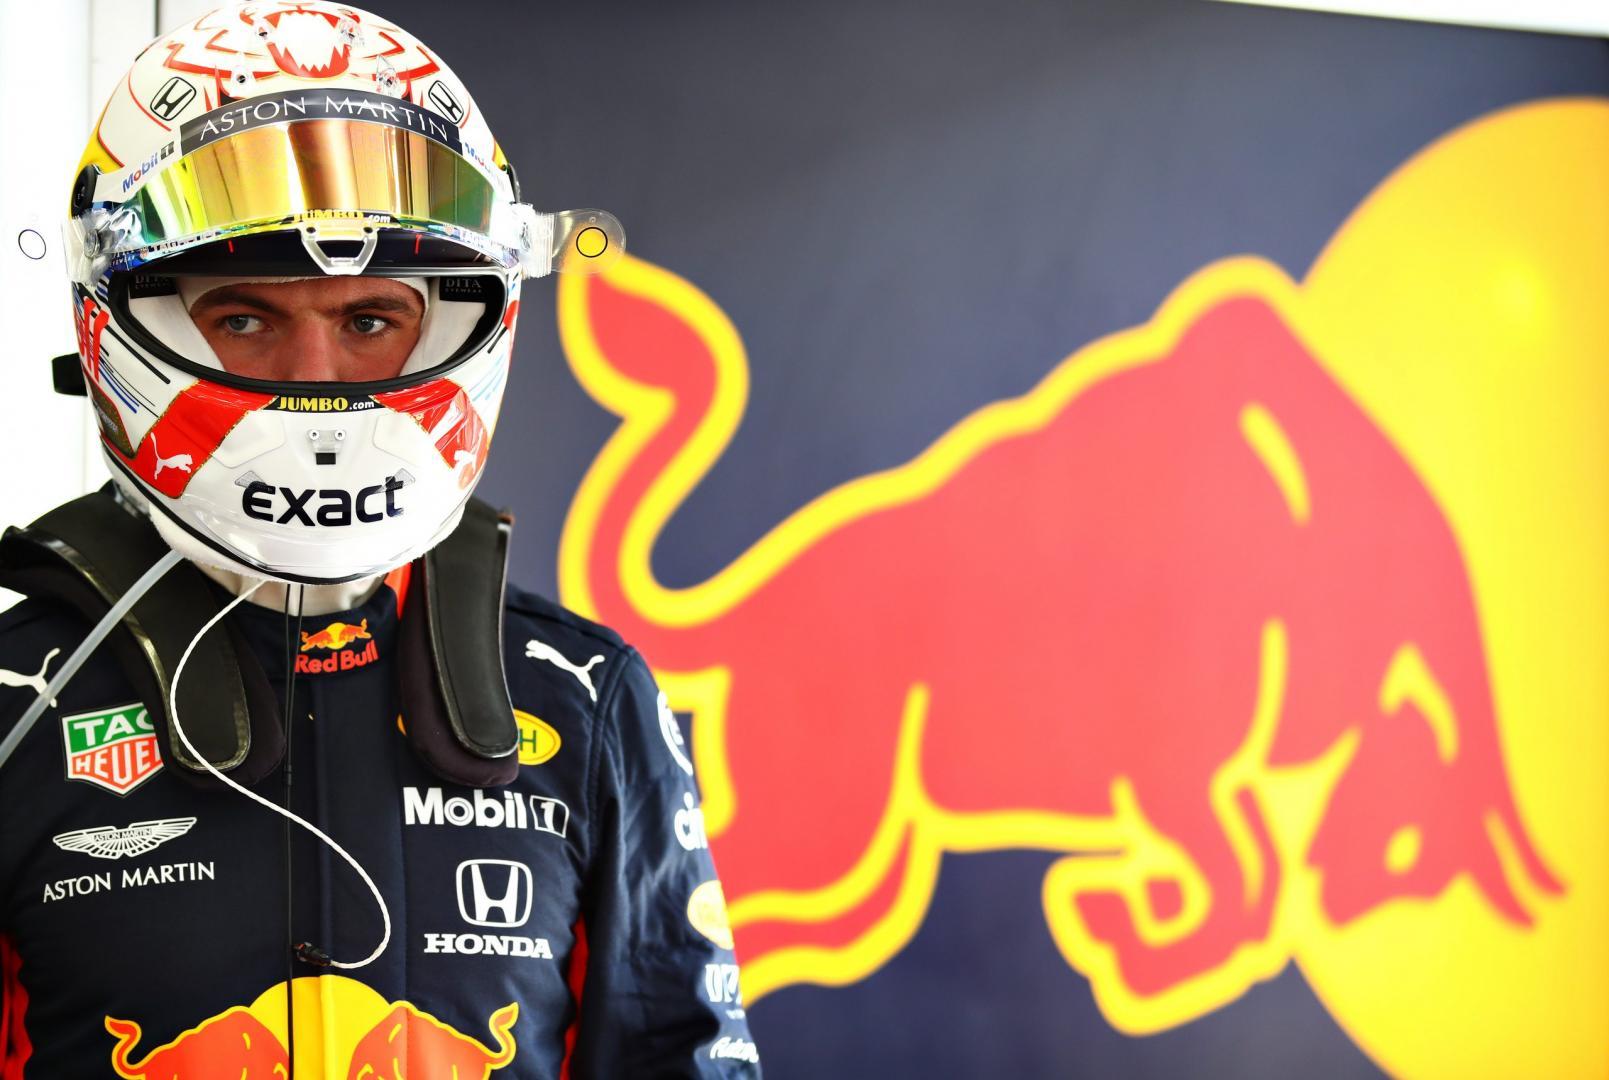 GP van Bahrein 2019 Red Bull Max Verstappen